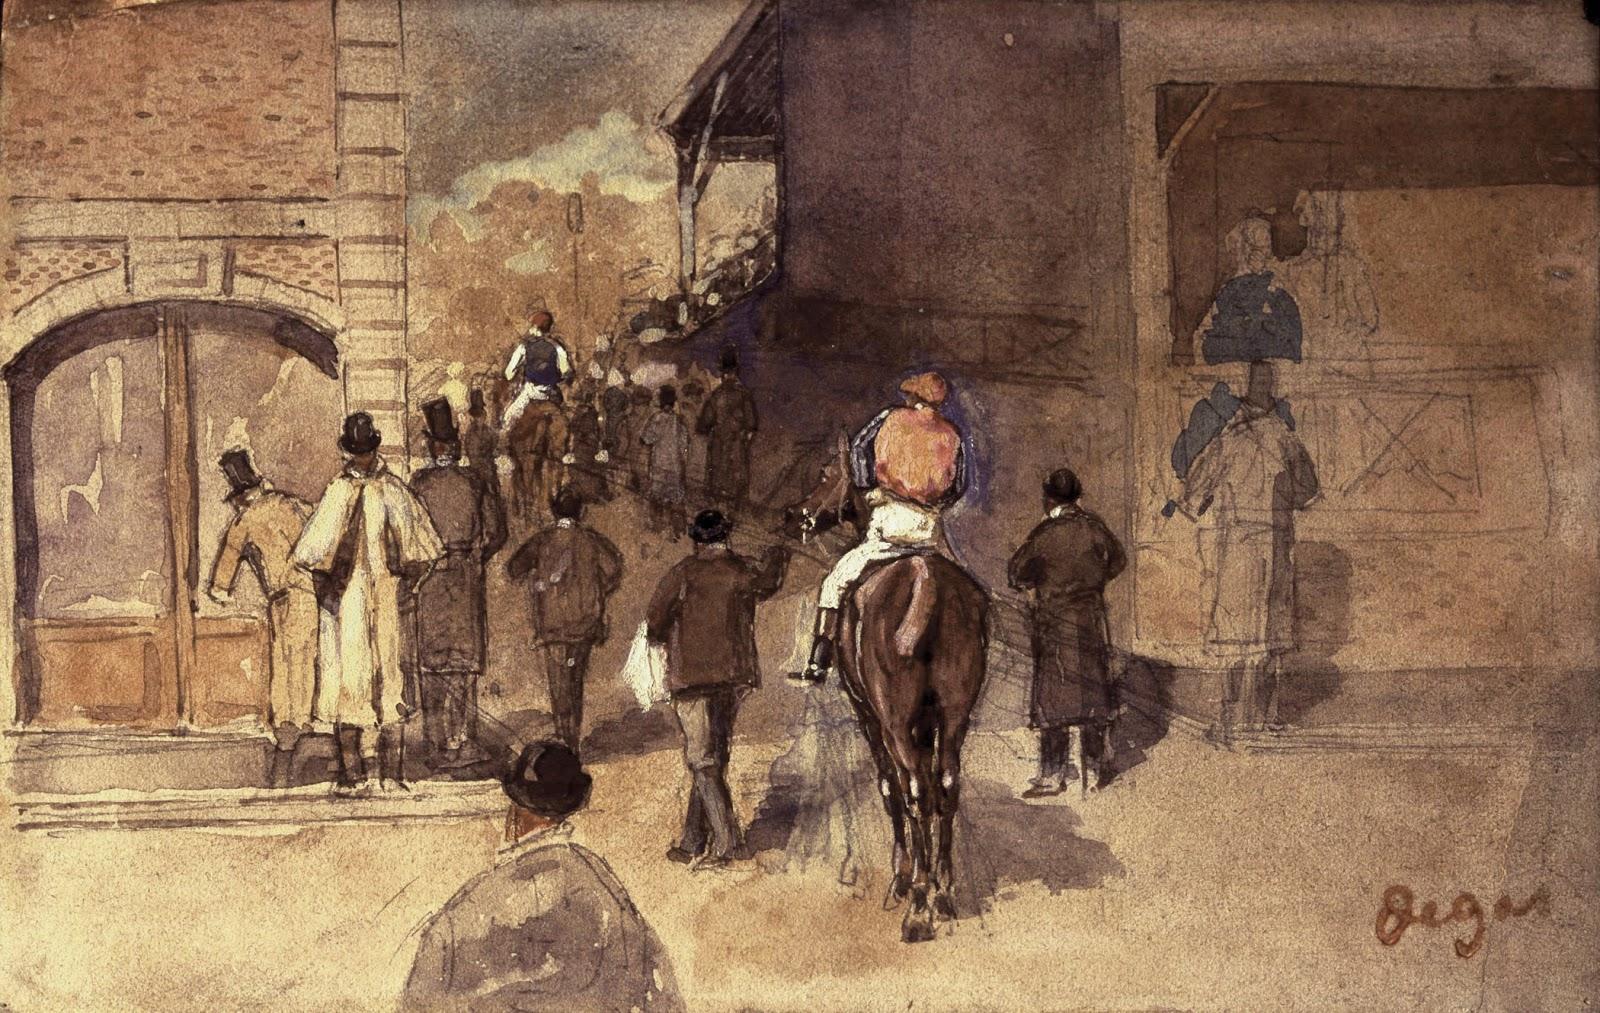 Sortie de pesage, 1866